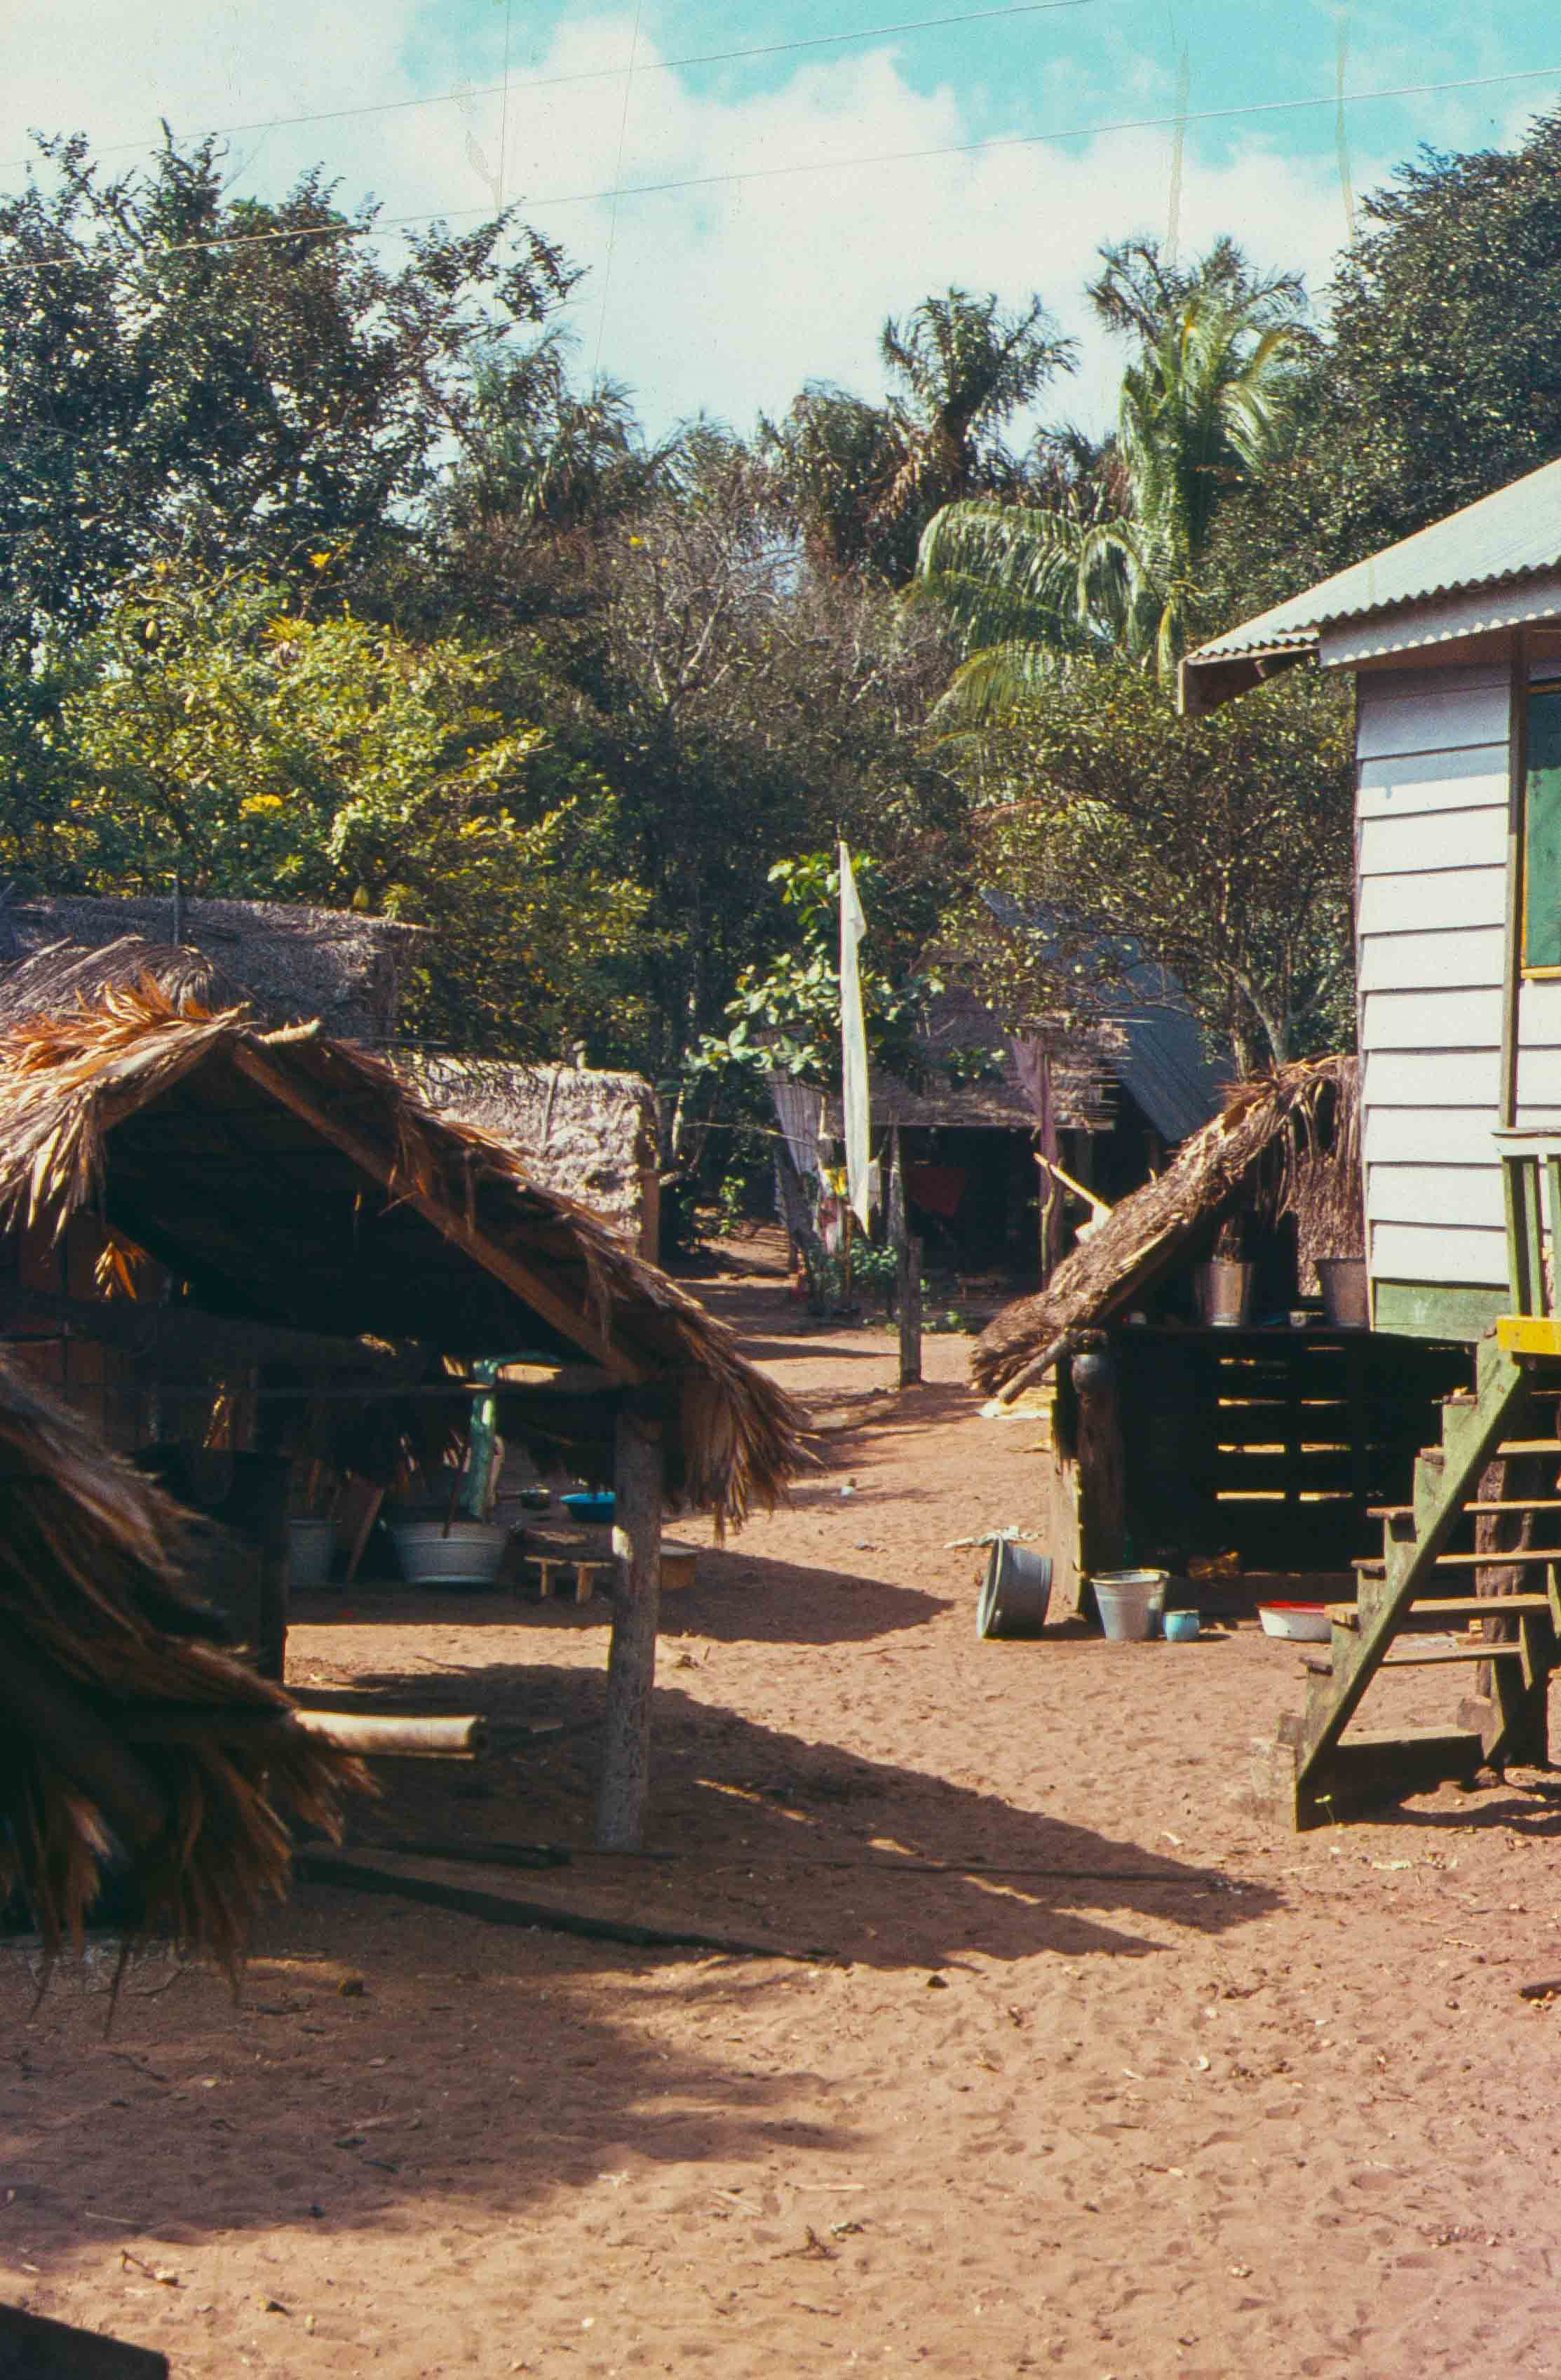 538. Suriname